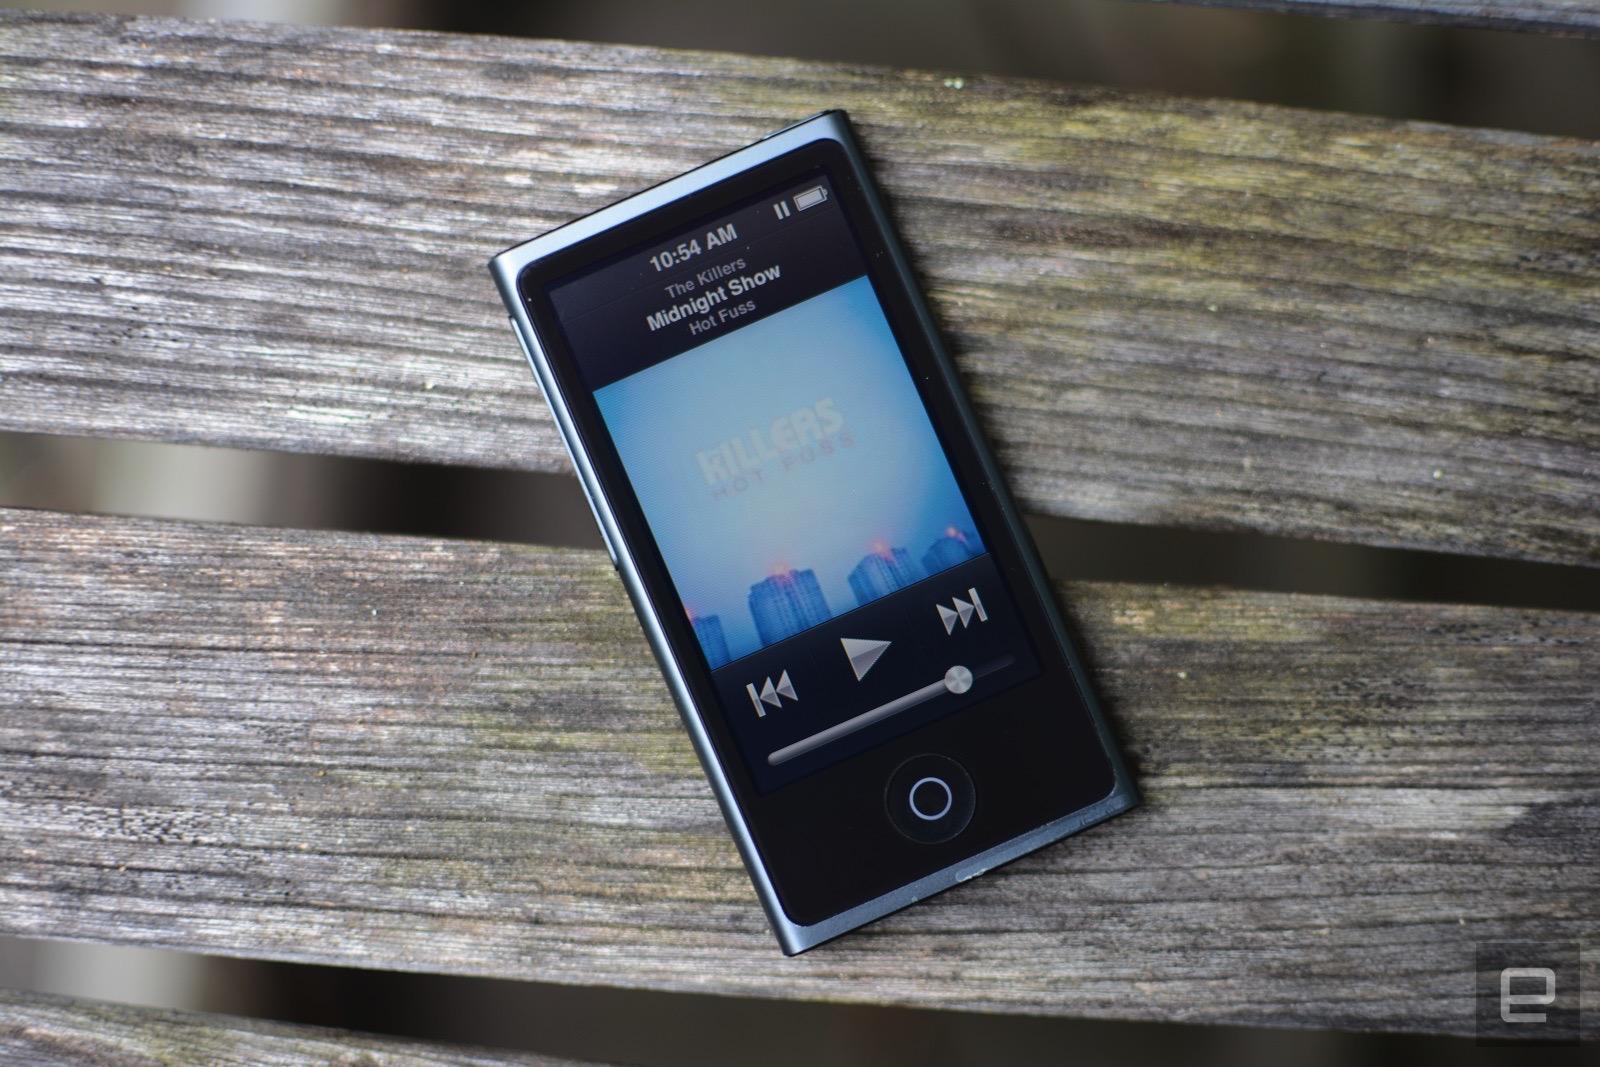 Apple discontinues iPod Nano and iPod Shuffle